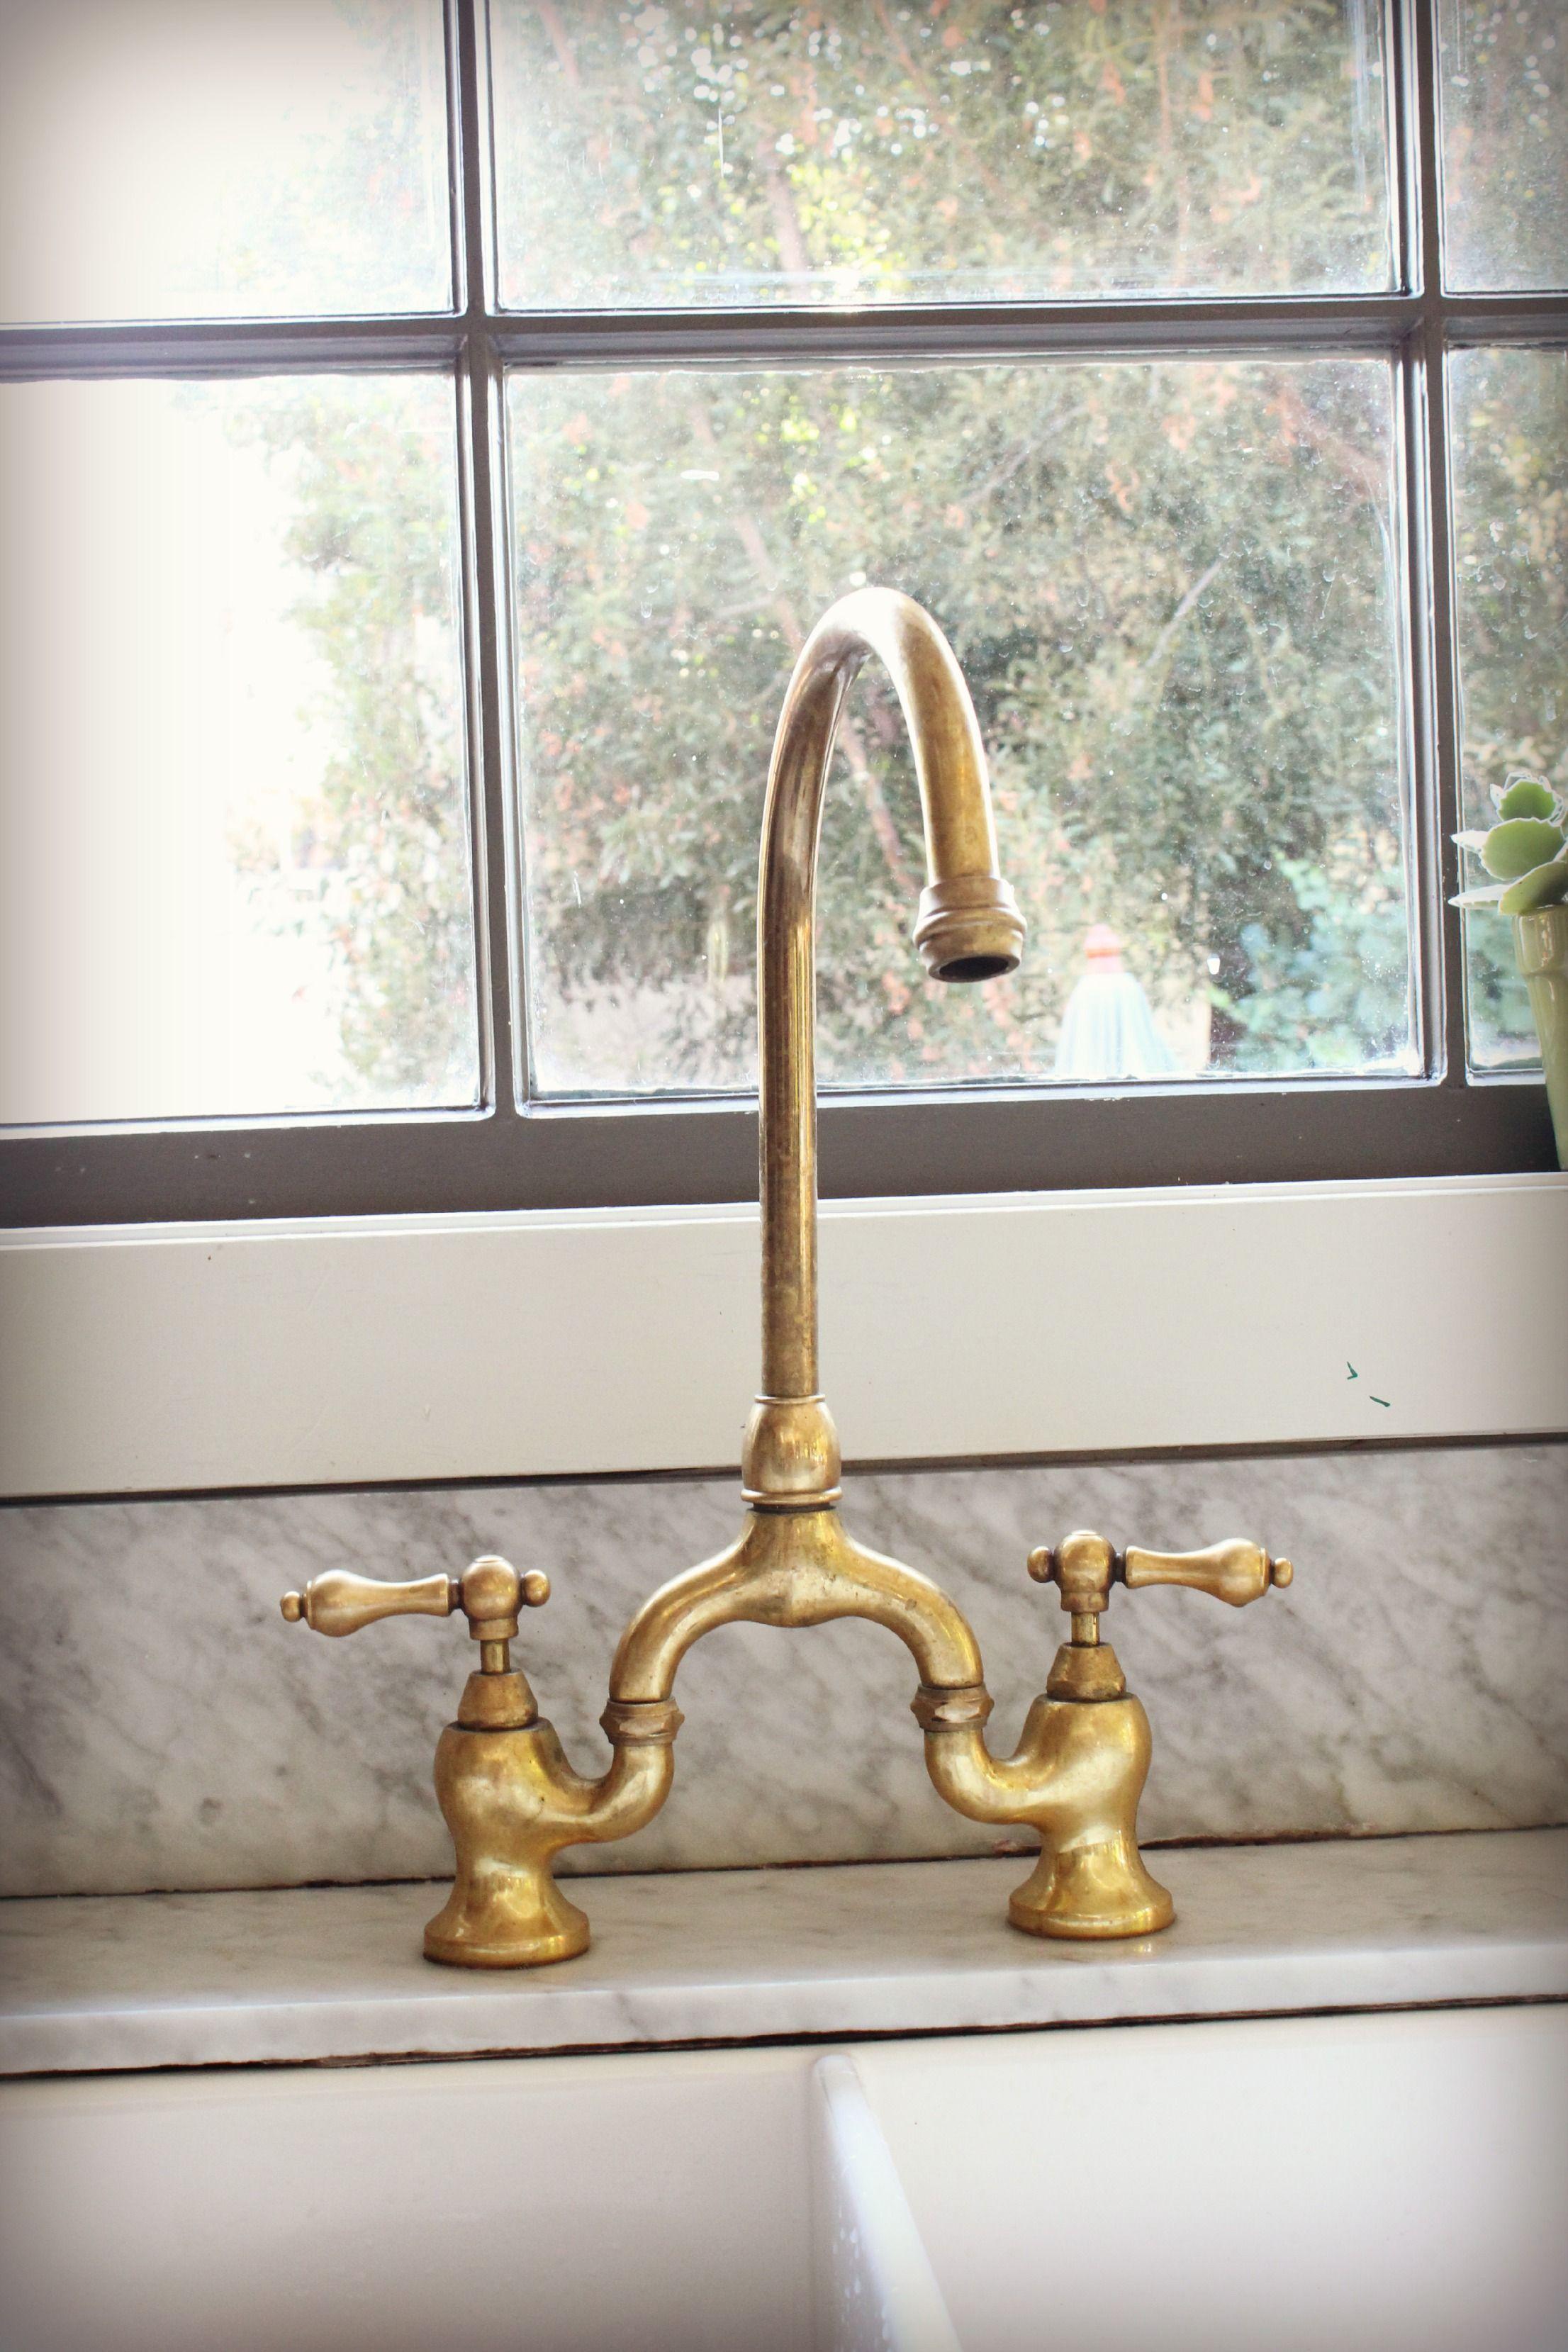 Unlacquered Brass Faucet, Unlacquered Brass Bathroom Faucet